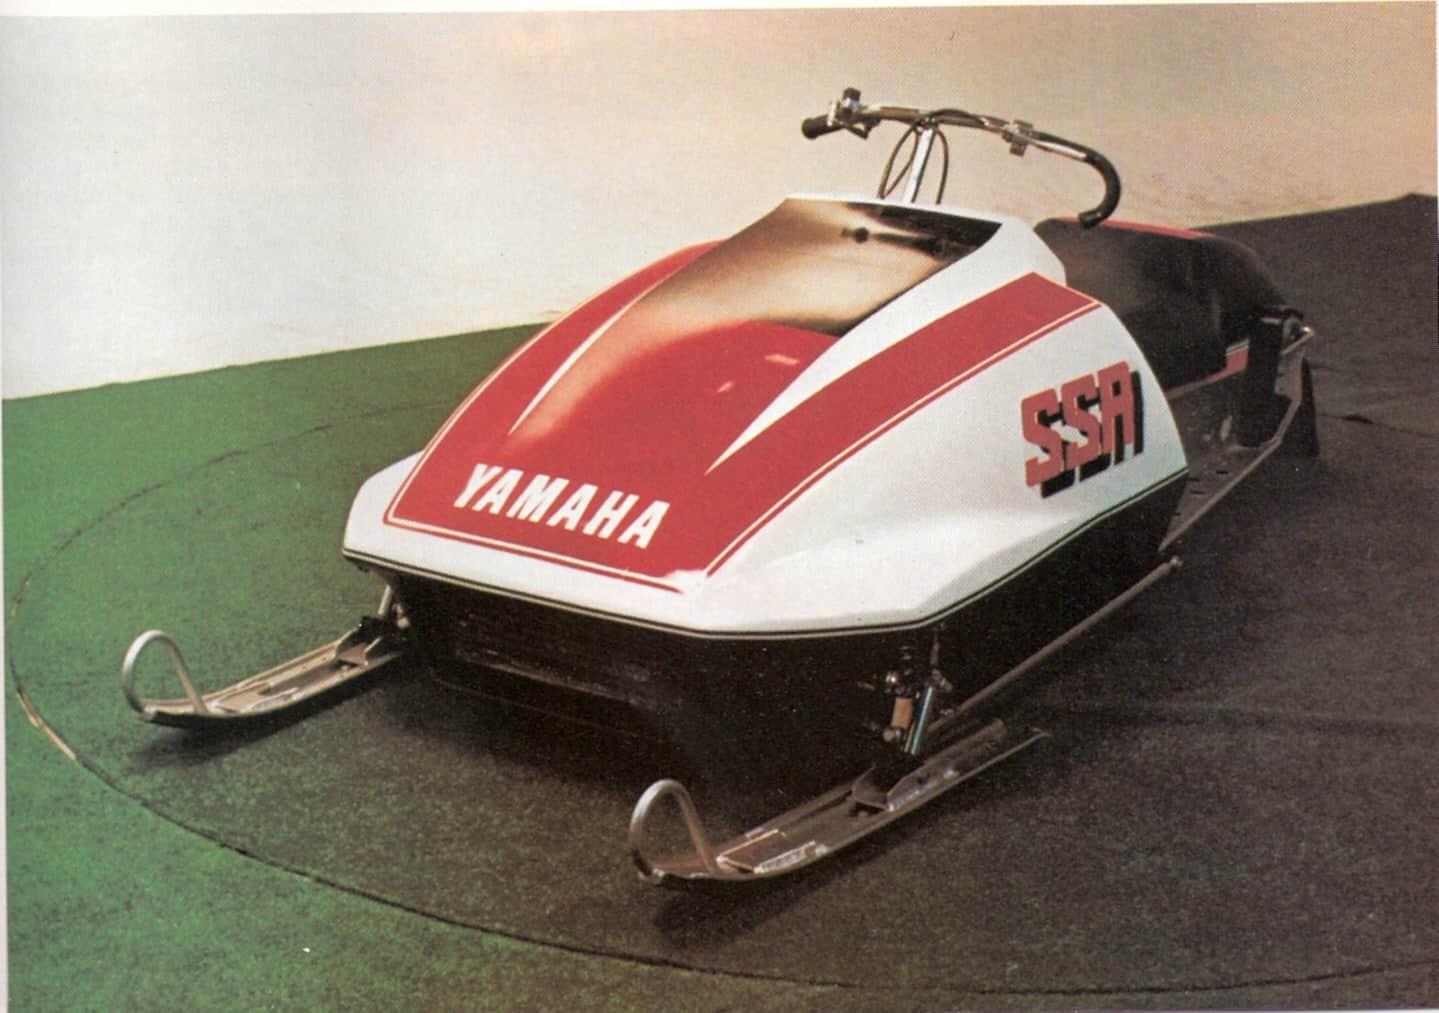 1978 Yamaha SSR oval race sled